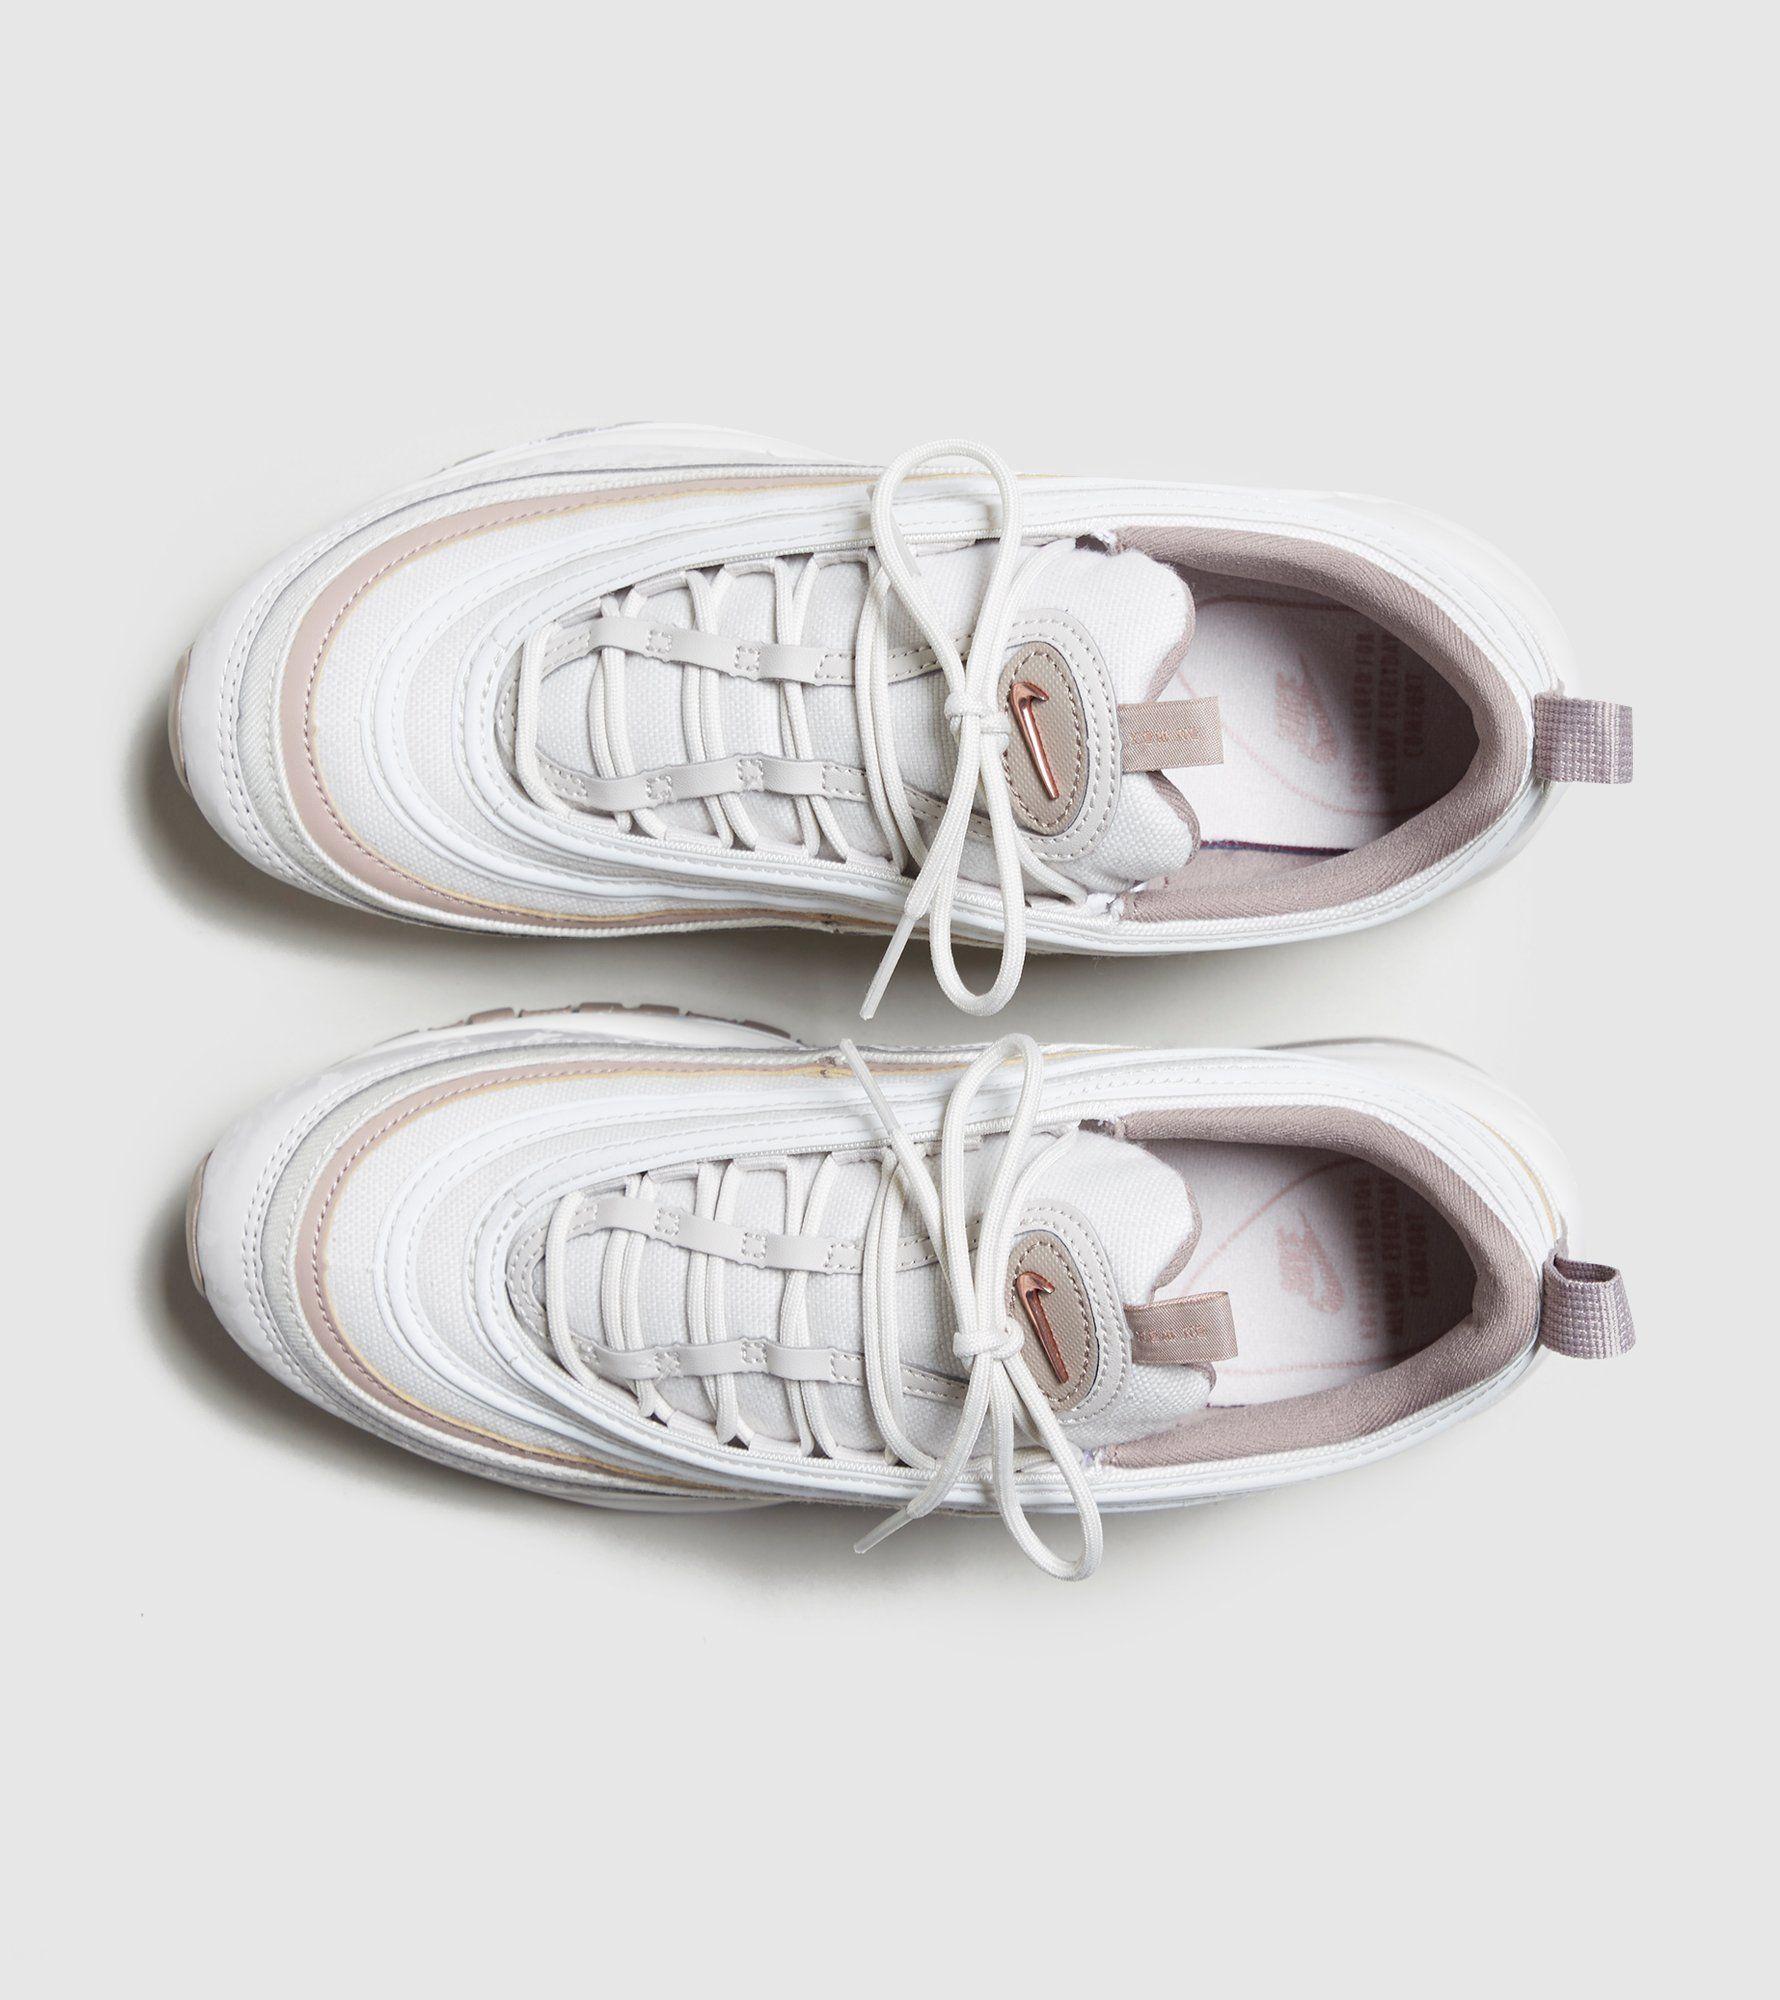 Nike Air Max 97 Women's